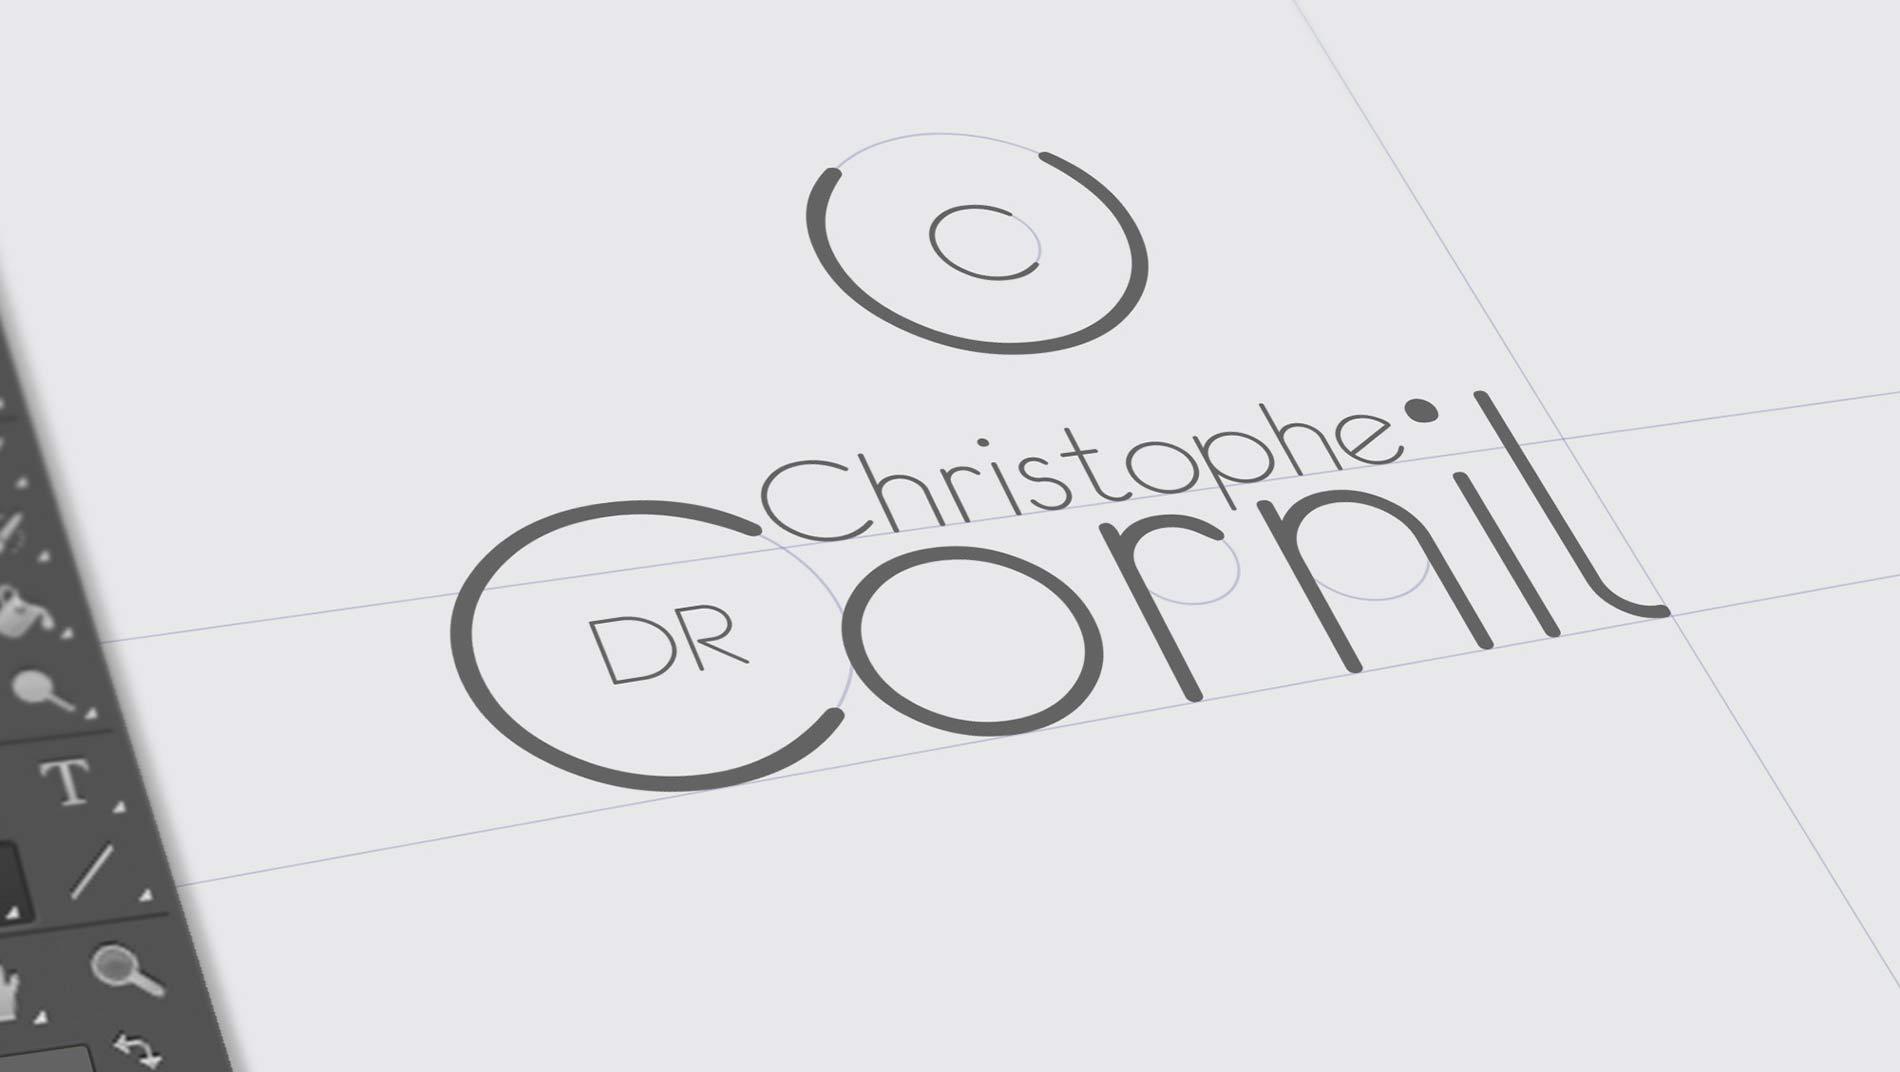 creation-logo-docteur-cornil-agence-sante-karma-communication-nice